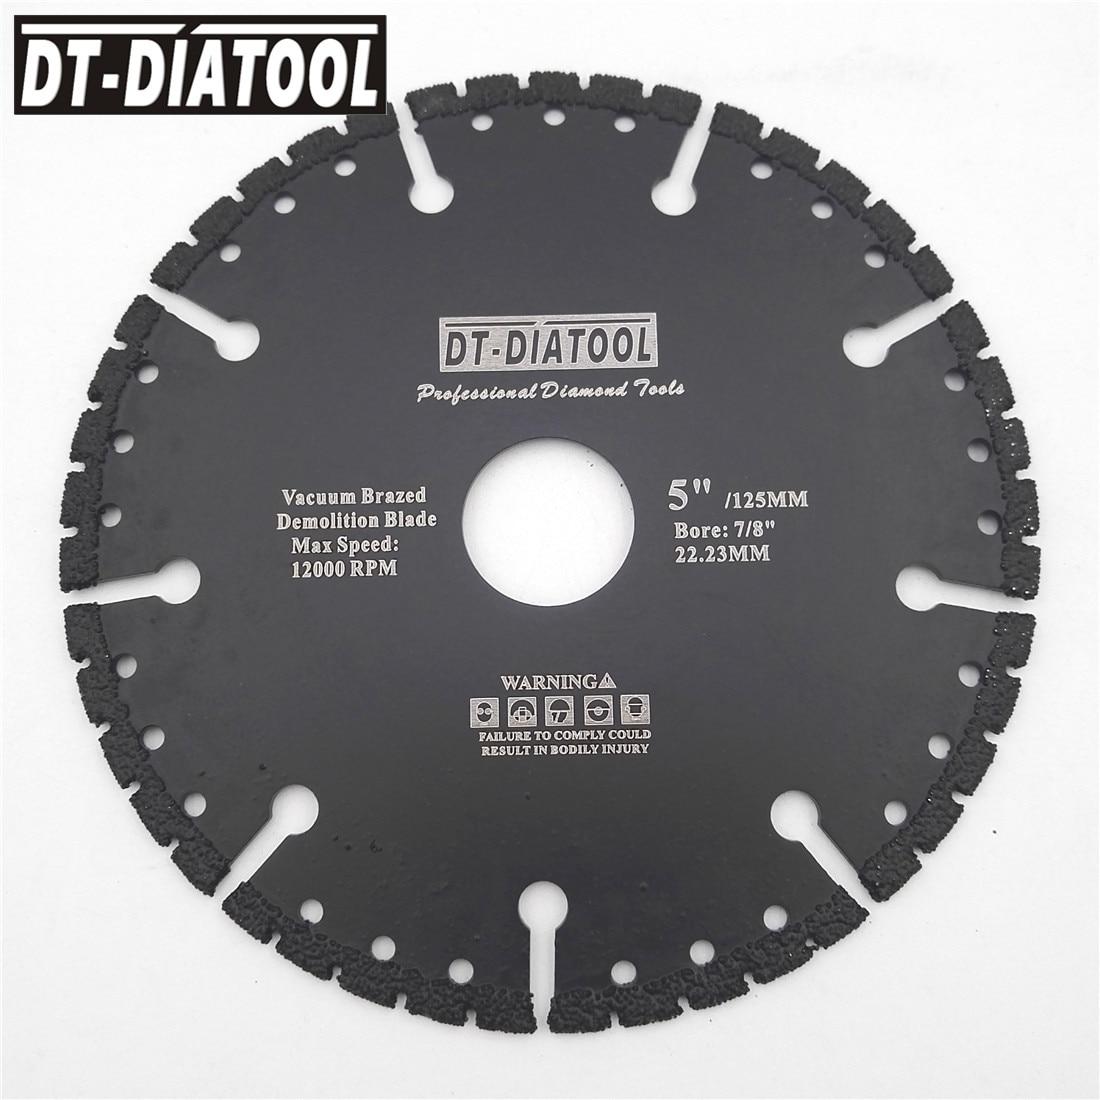 DT-DIATOOL Vacuum Brazed Diamond Saw Blade All Purpose Demolition Blade Cutting Disc Steel Metal Stone Cast Iron Rebar Aluminum